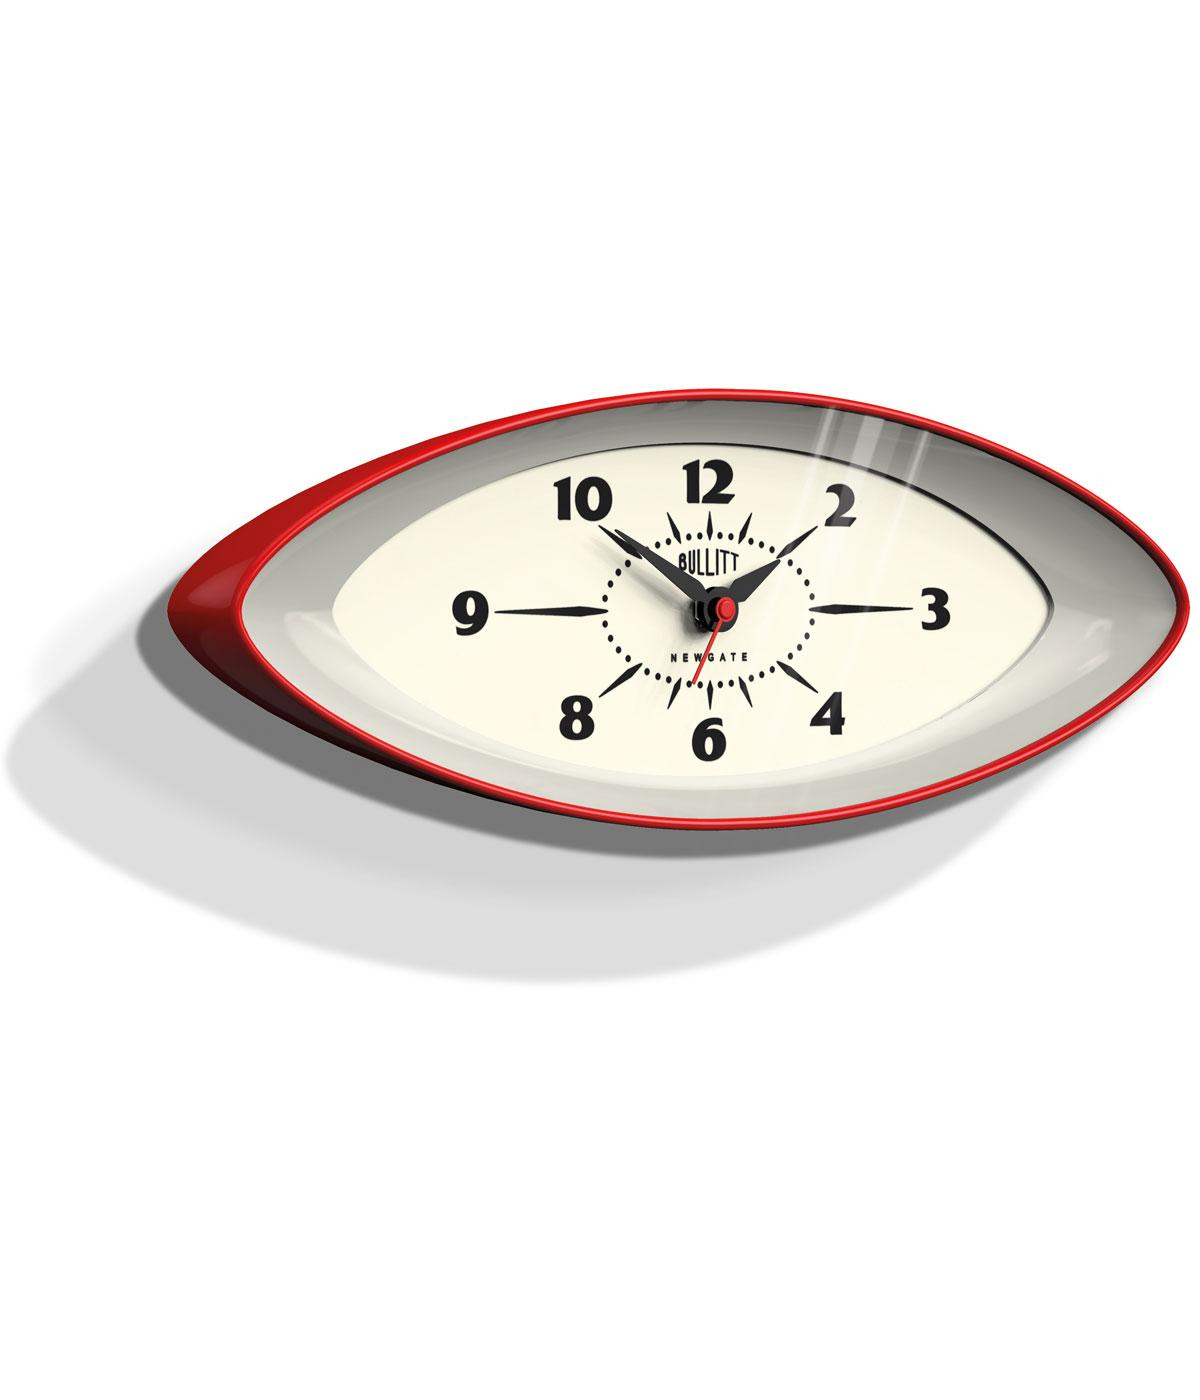 Bullit NEWGATE Retro 60s Mod Space Age Wall Clock